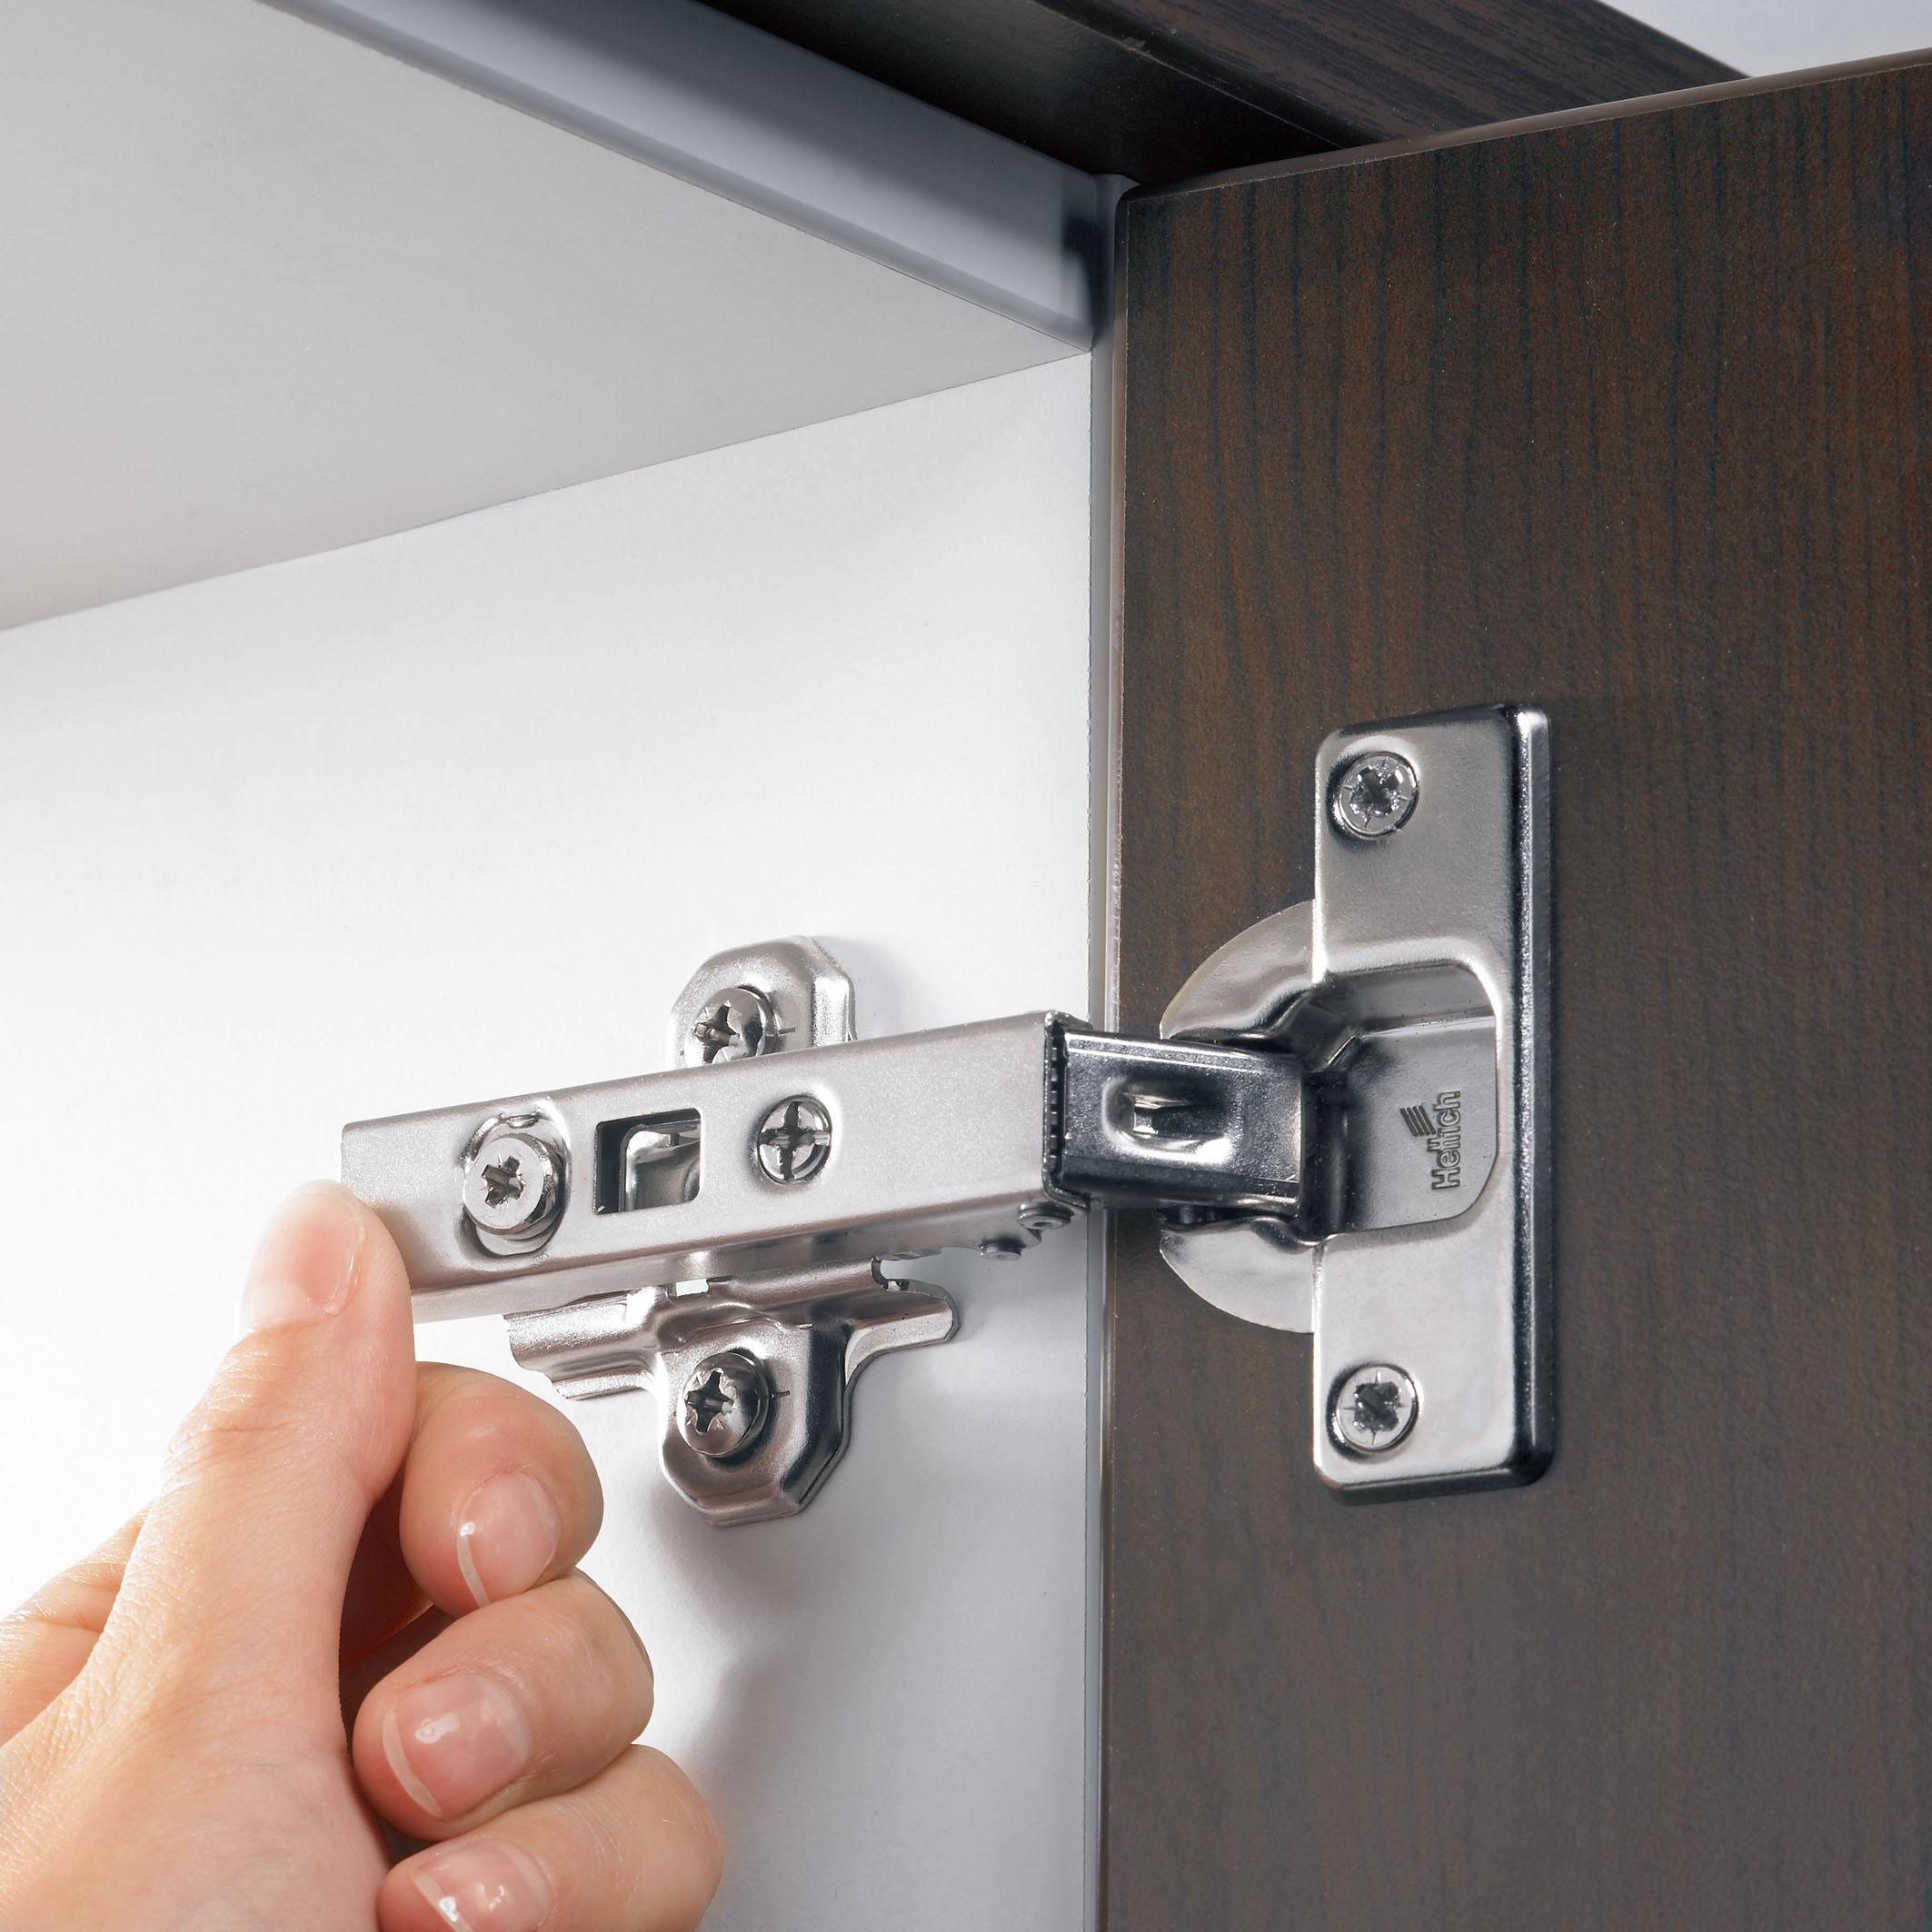 cupboard kitchen organization adjustment cabinets door hardware soft cabinet adjusting ideas elegant pantry close of hinges